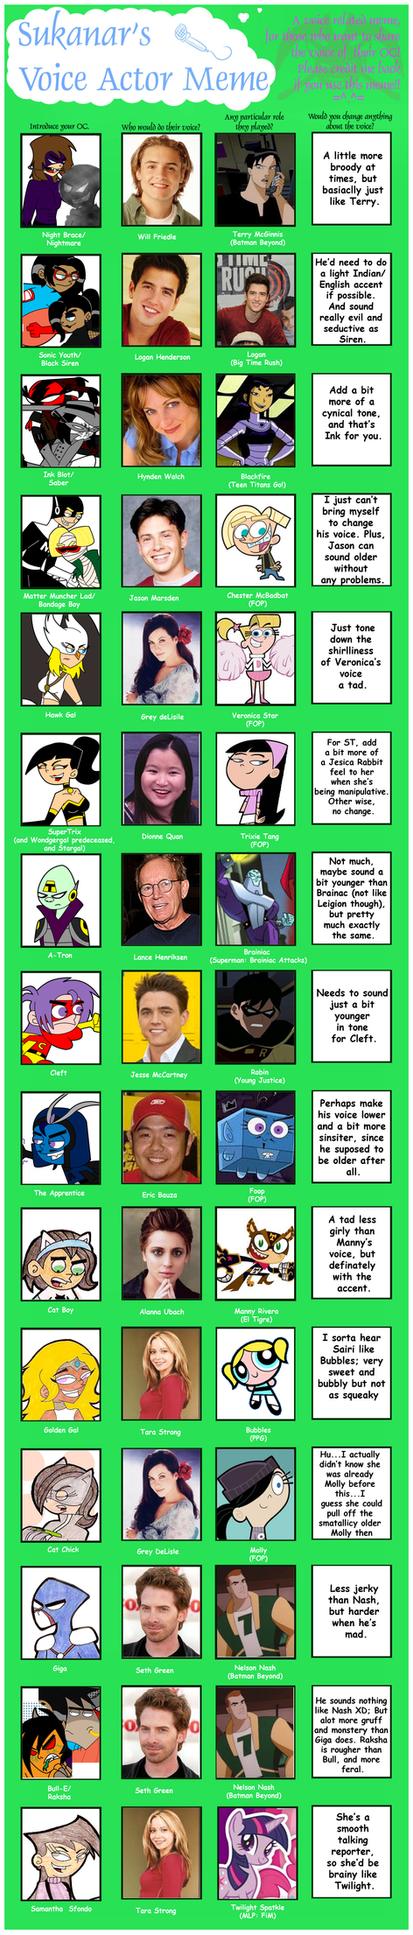 Cartoon Characters Voice Changer : Voice actor meme super fop by kpendragon on deviantart